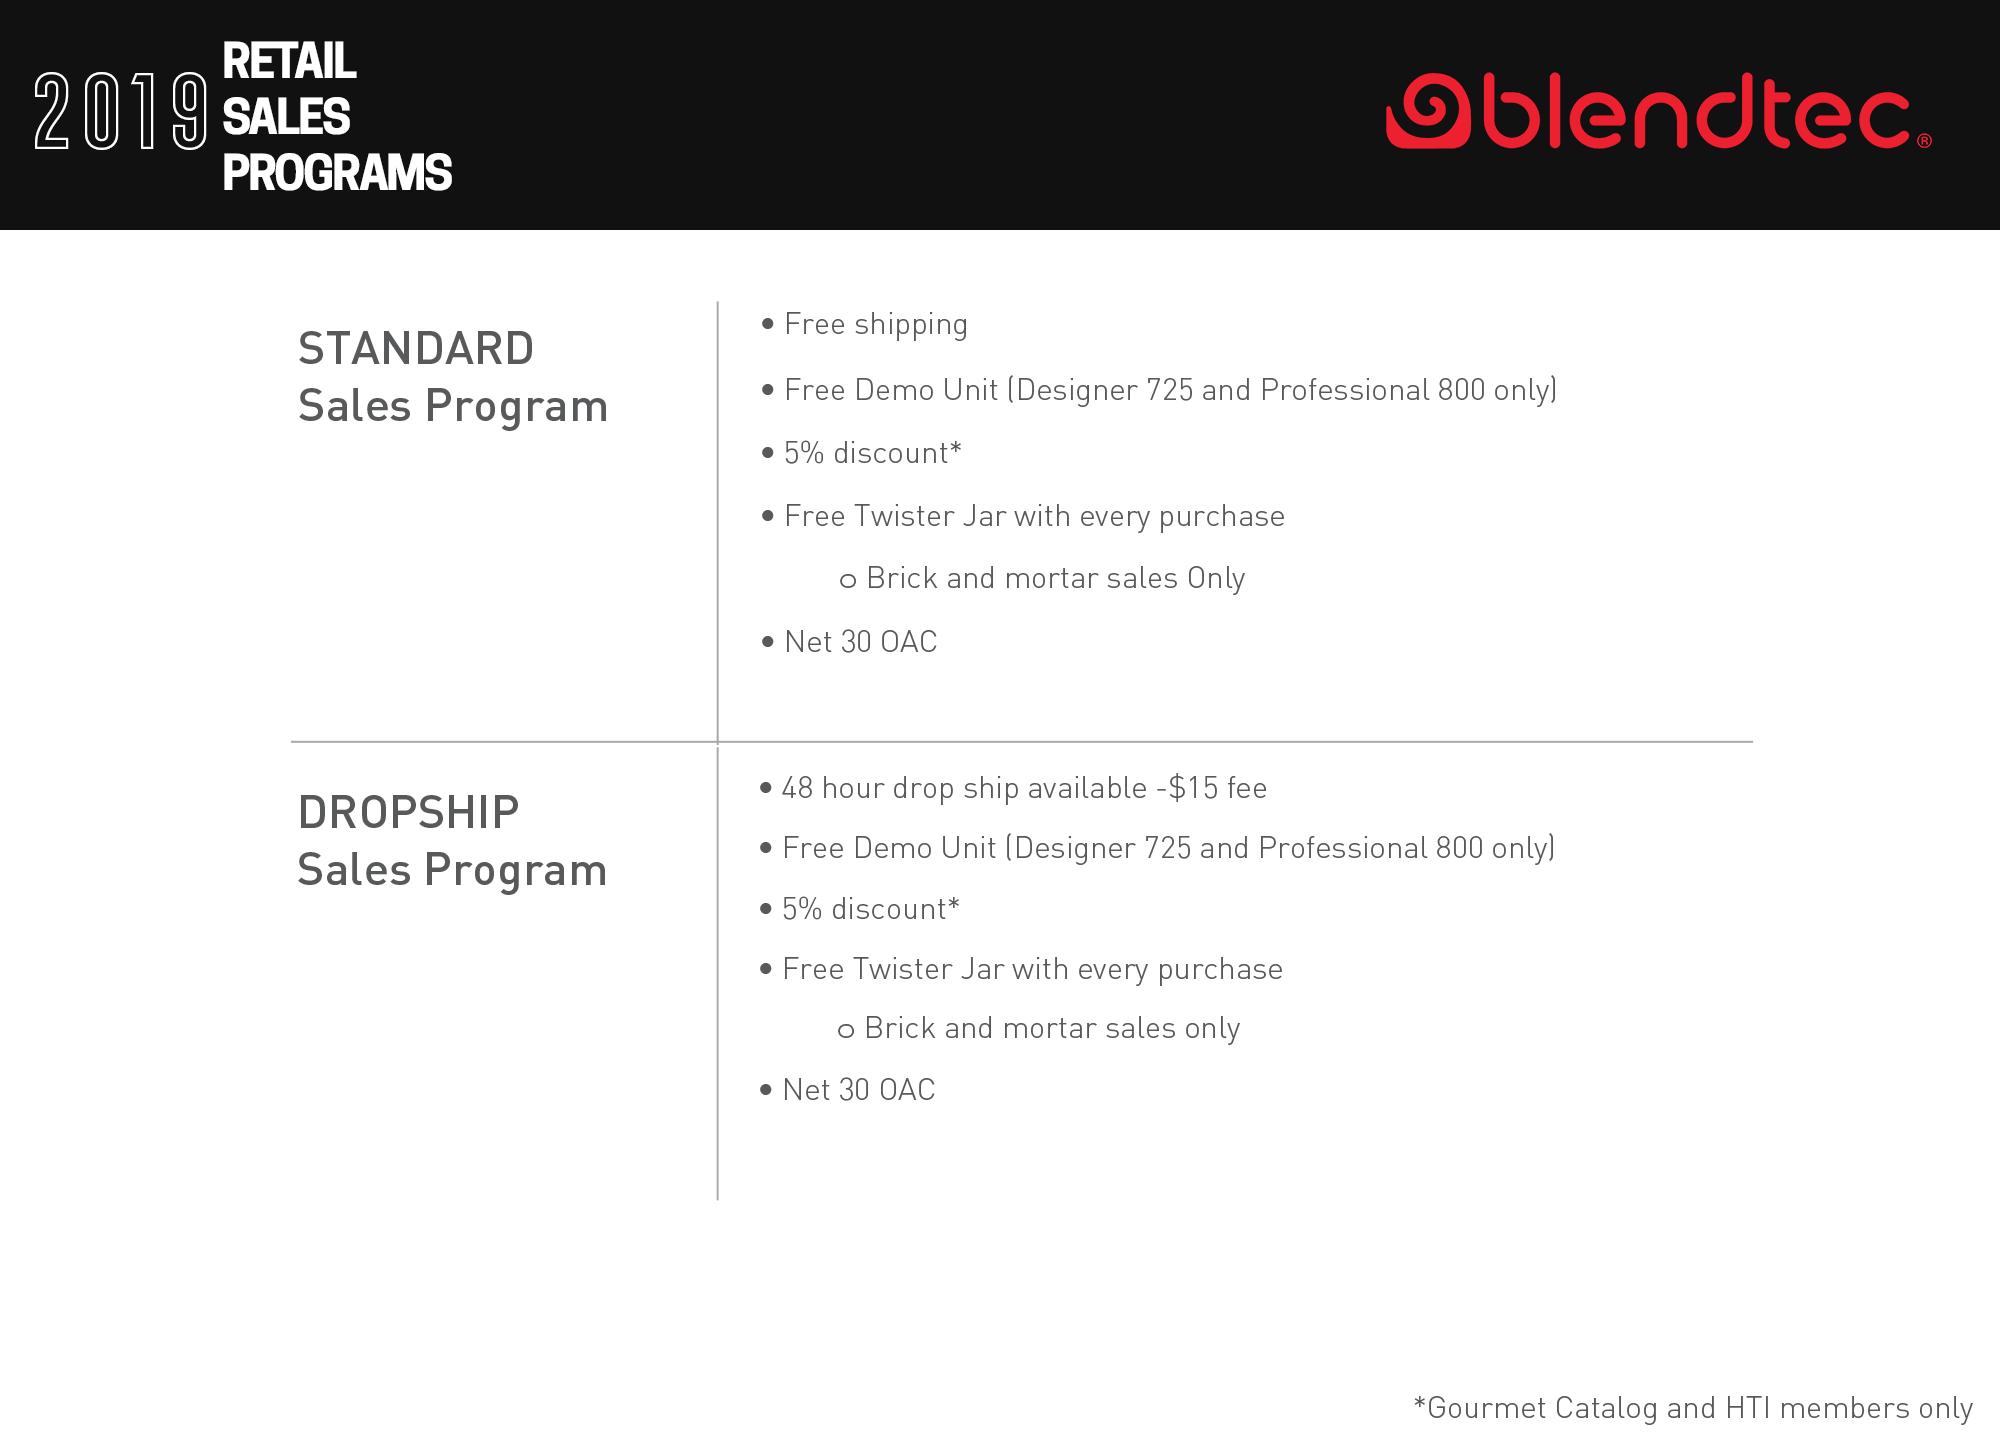 Retail Sales Programs 2019.png